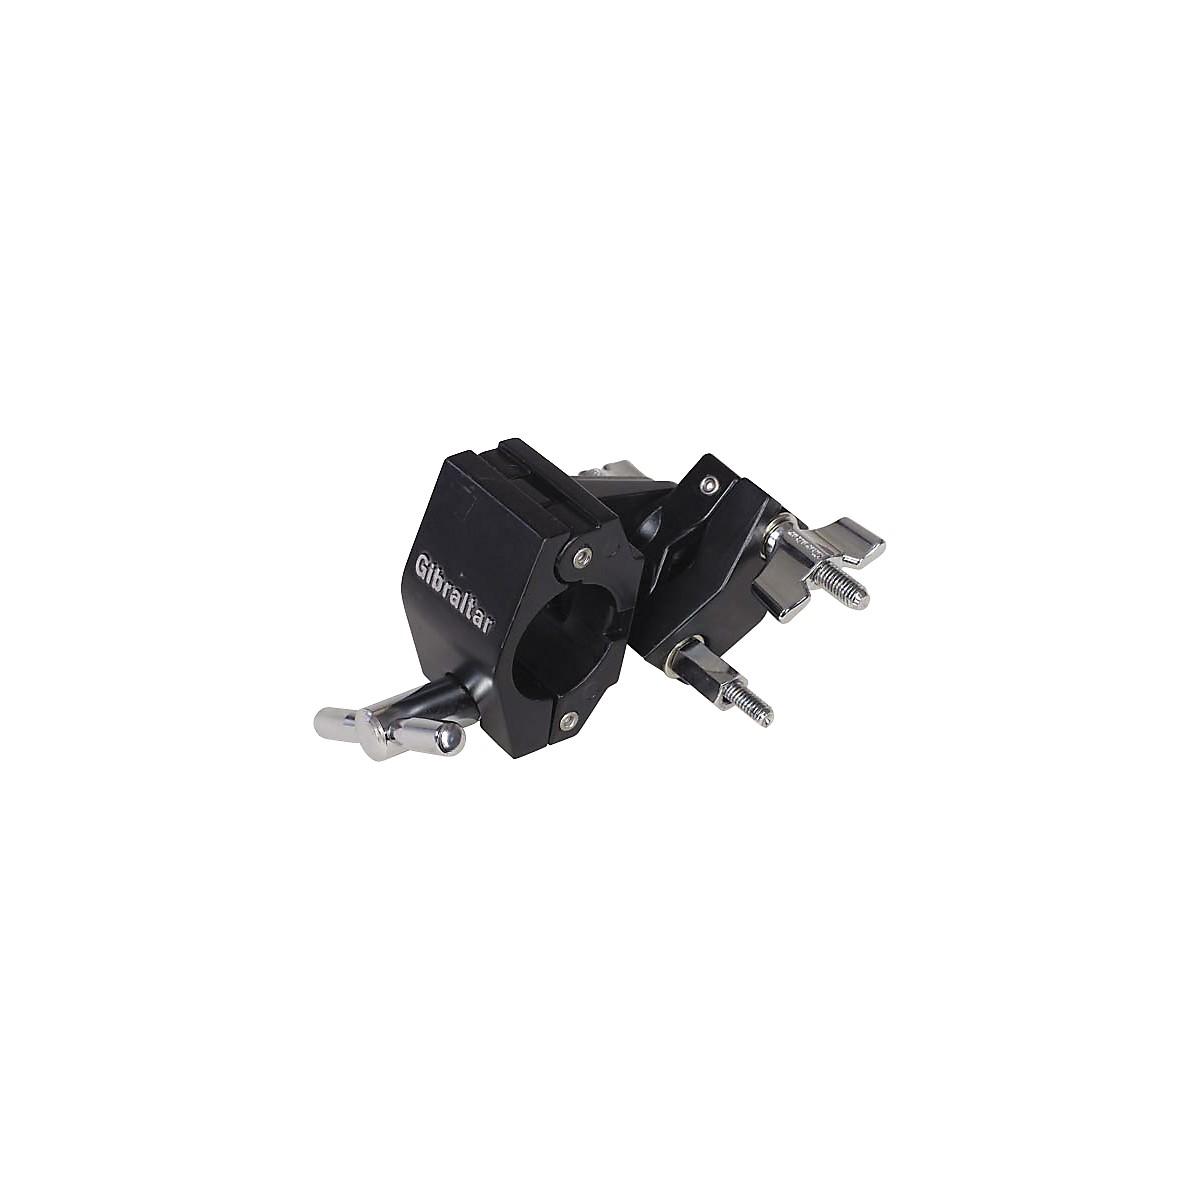 Gibraltar RS Adjustable Multi Clamp